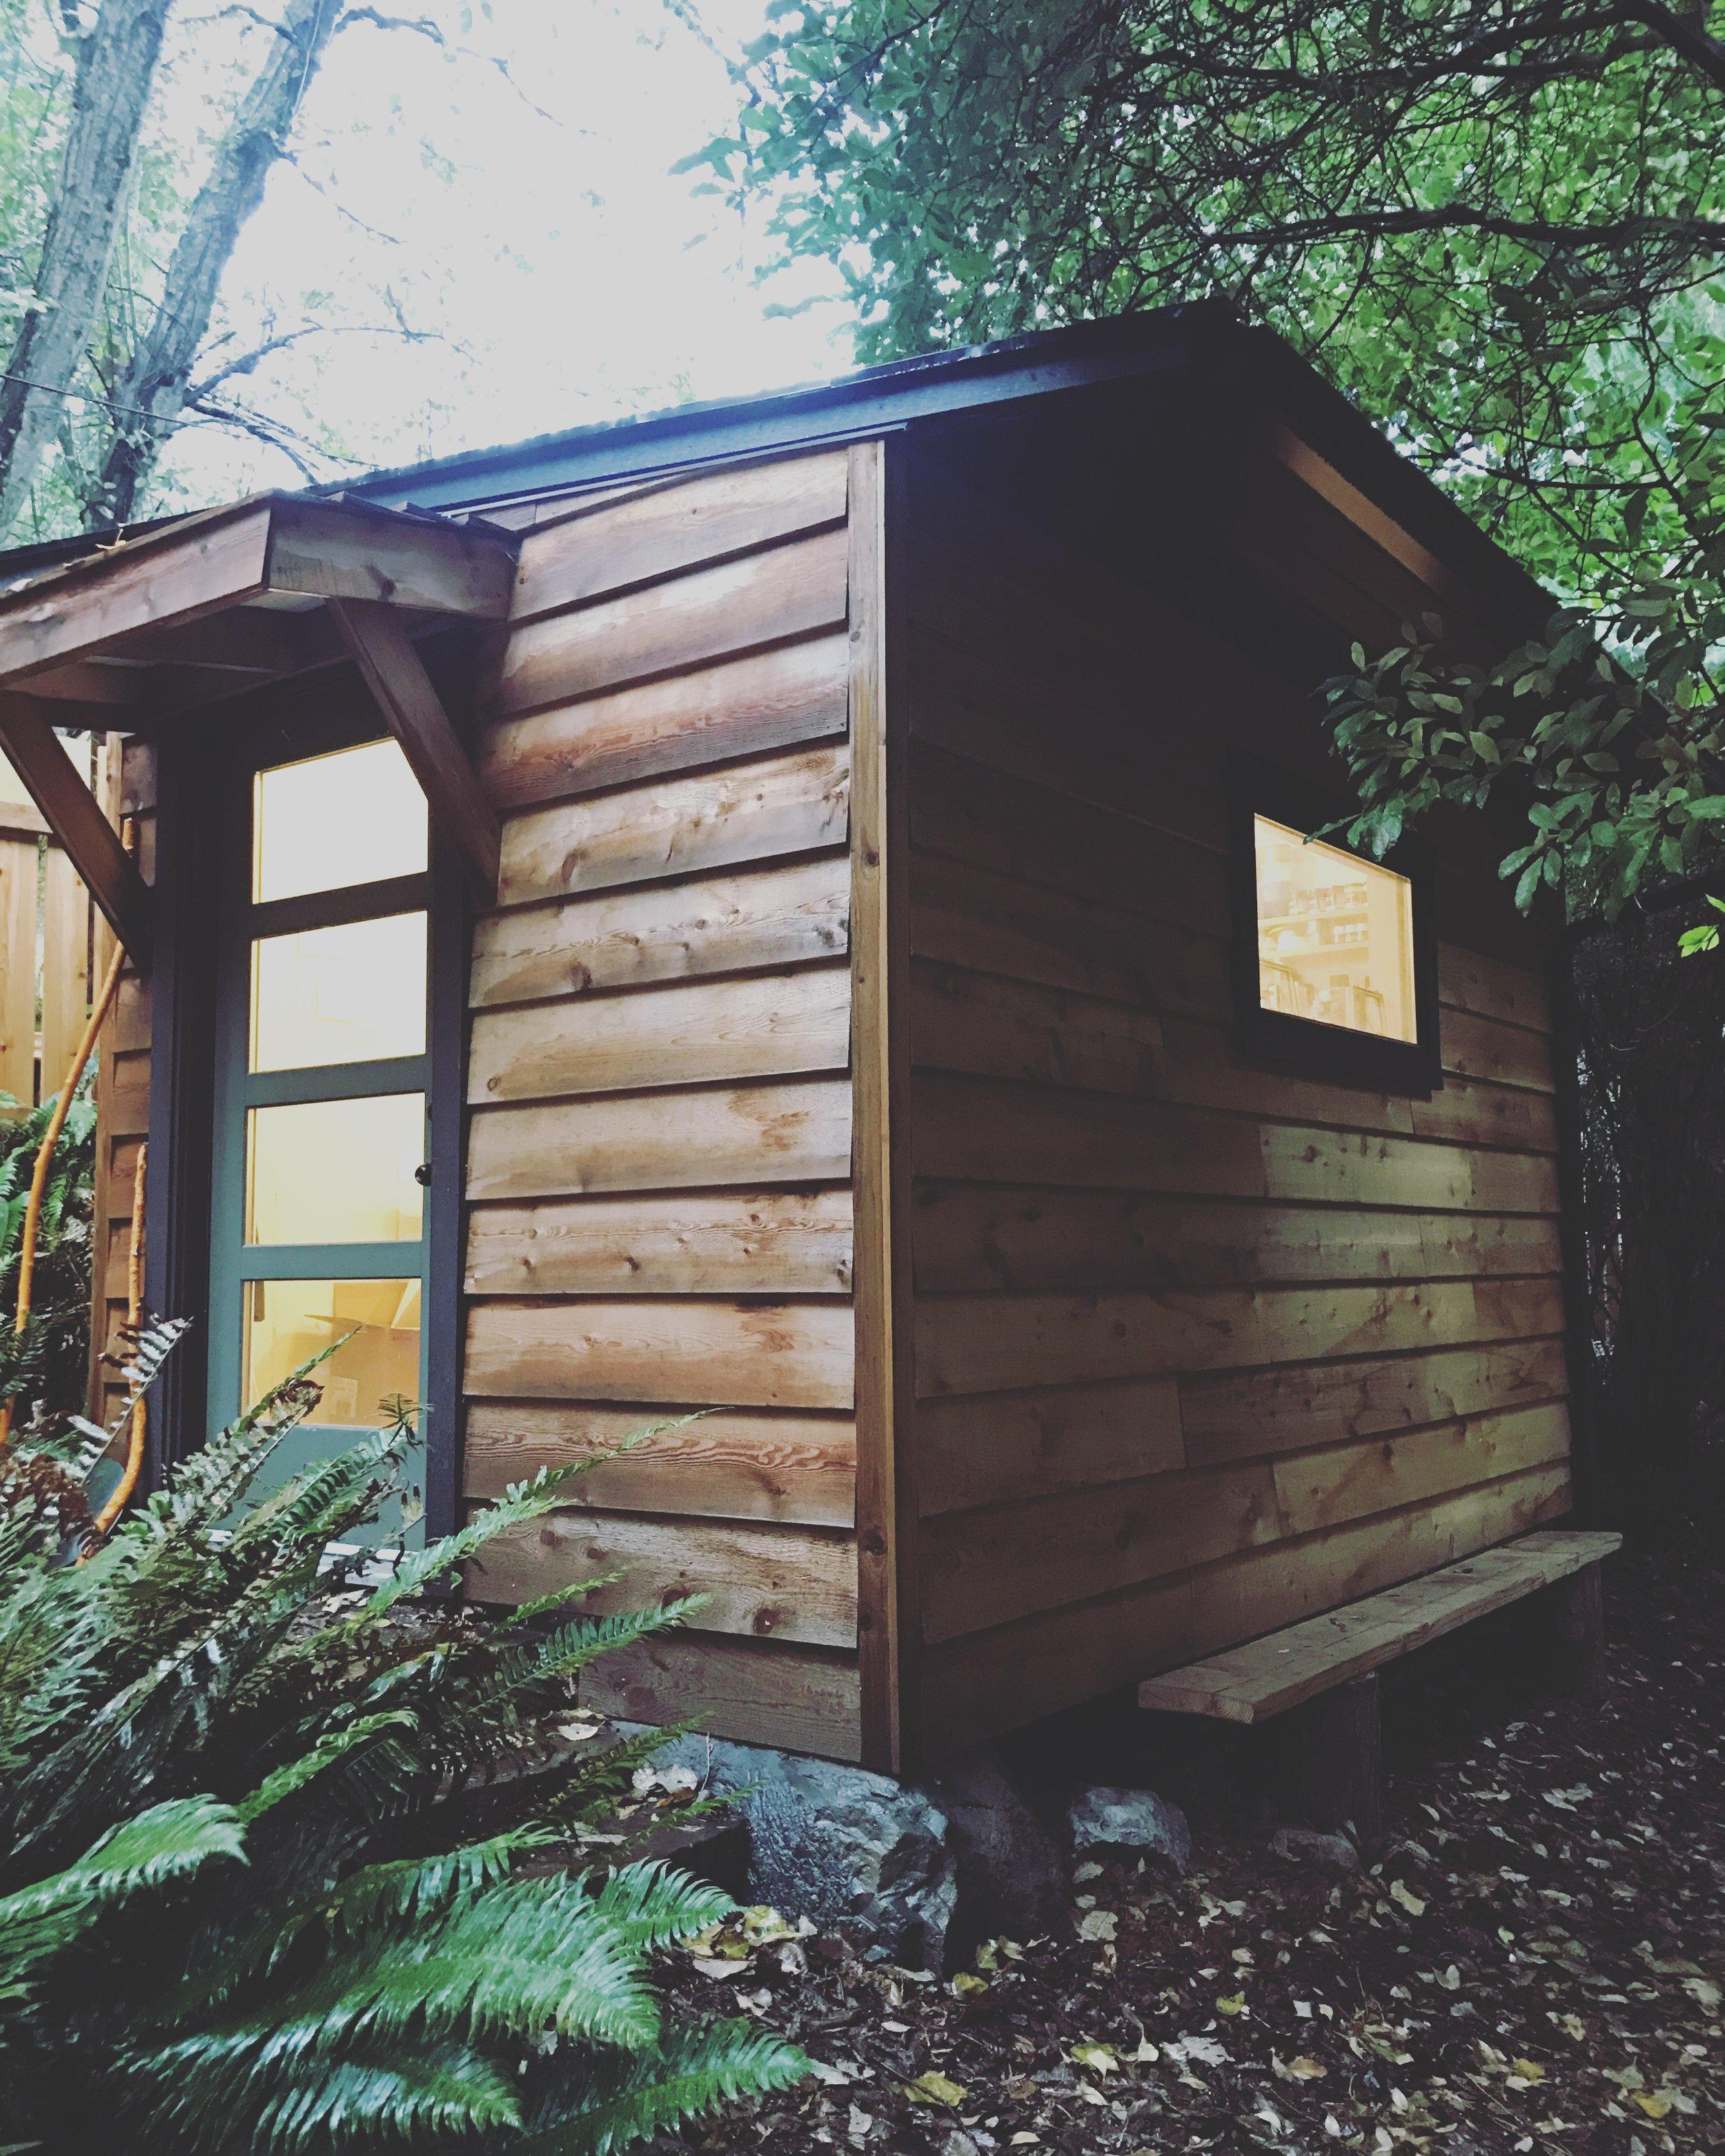 Studio on Bowen Island, BC